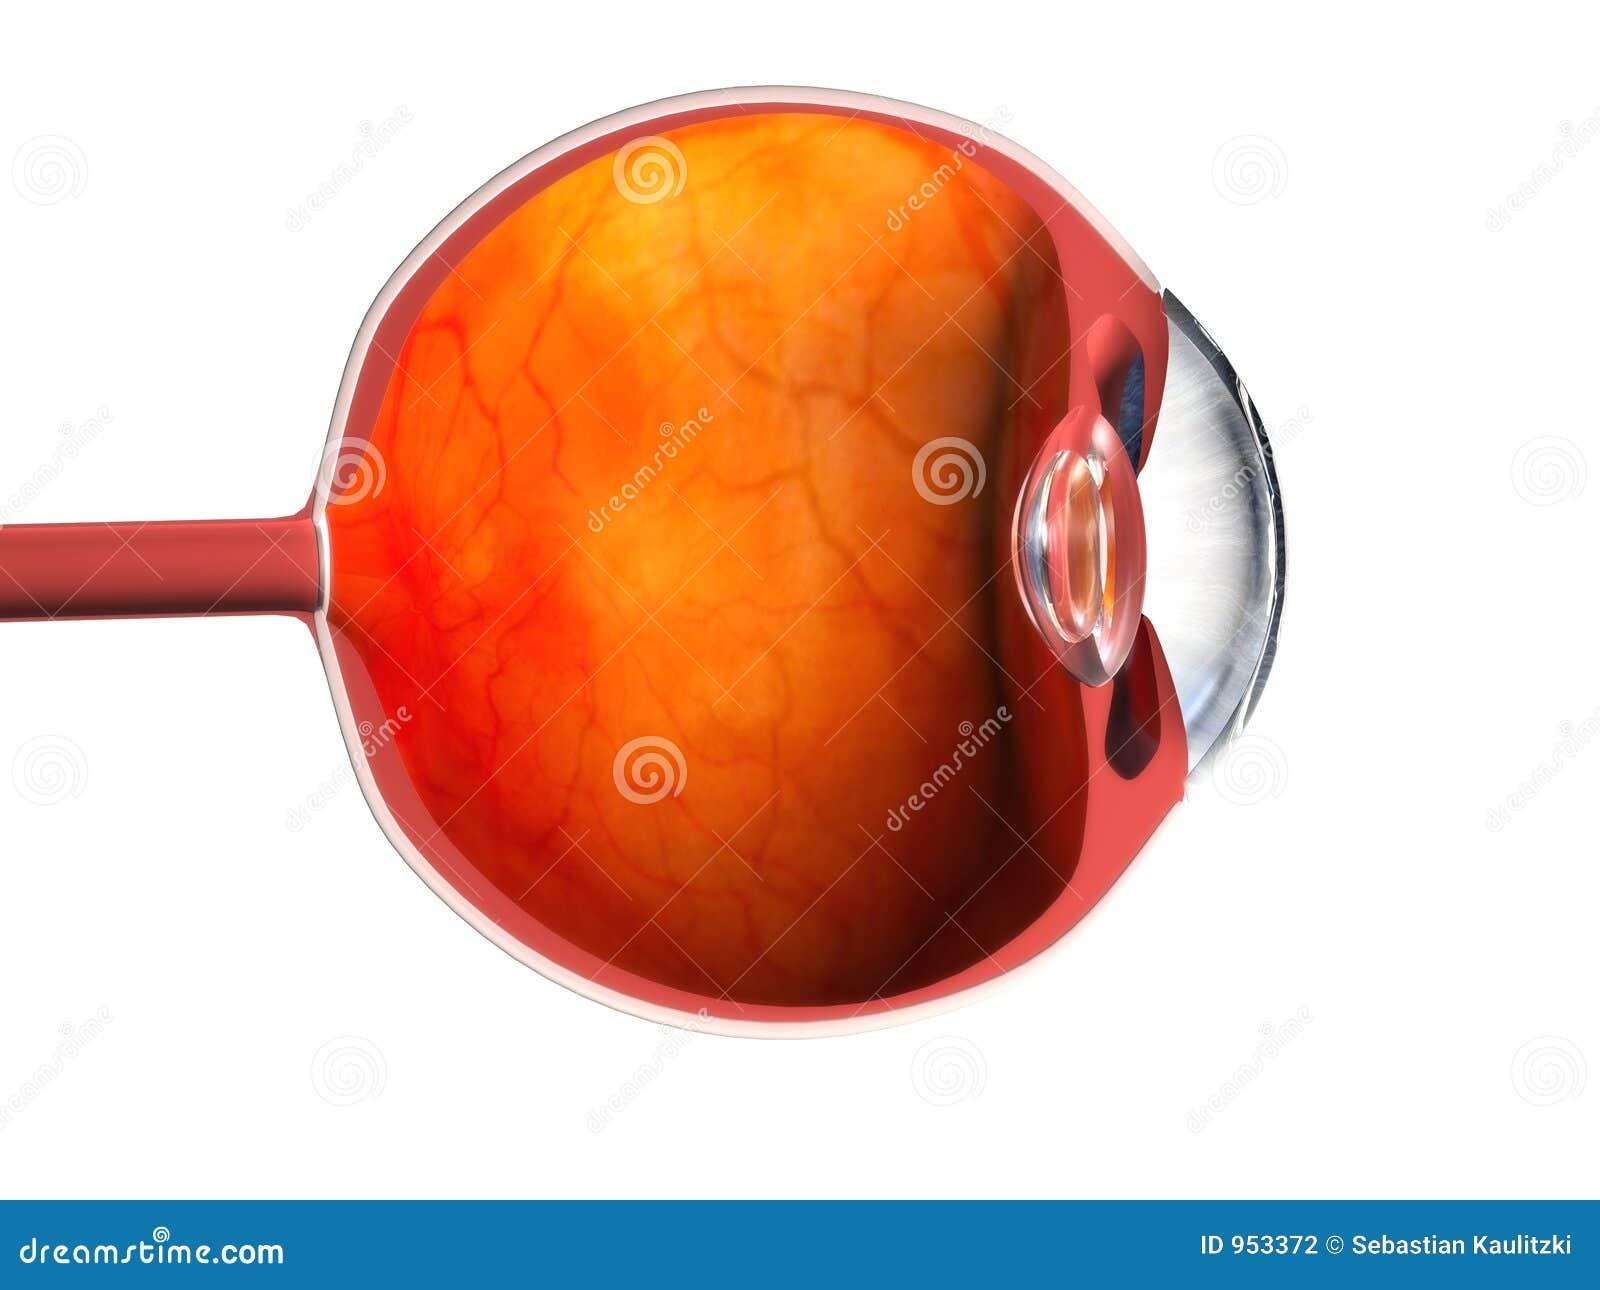 3d eye stock illustration  Illustration of view, pupil - 953372